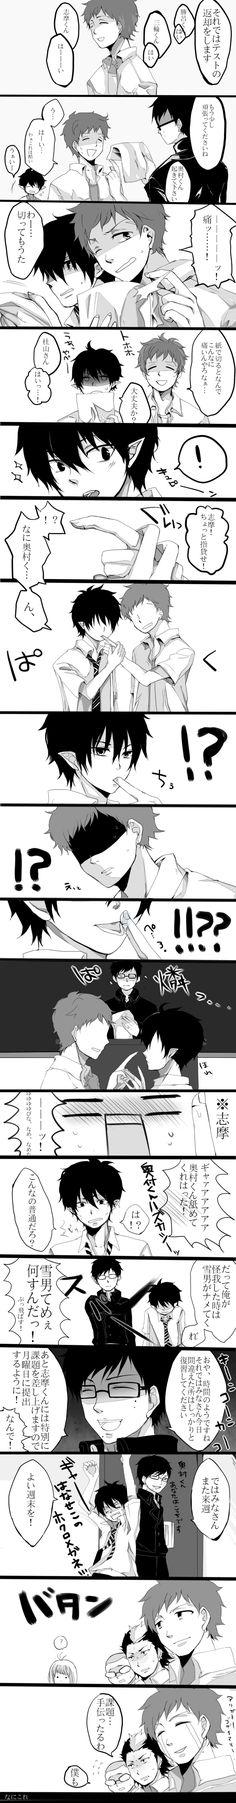 Yukio: I'll return your tests now. Suguro-kun! (Here.) Miwa-kun! (Here.) Shima-kun! (Here.) Yukio:Try a little harder next time. Okumura-kun, wake up. Shima: Man, he's harsh. Shima: Ow, paper cut. Shima: How do paper cuts even hurt this much? Rin: You okay? Yukio: Moriyama-san (Here!) Rin: Shima! Gimme your finger for a sec. Shima: What are you-- (deformed face) Note: This is Shima Shima: H-he l-l-l-l-licked... Shima: Aaaaaaaah! He licked my finger! This is so embarrassing! Rin: Wait, what's…